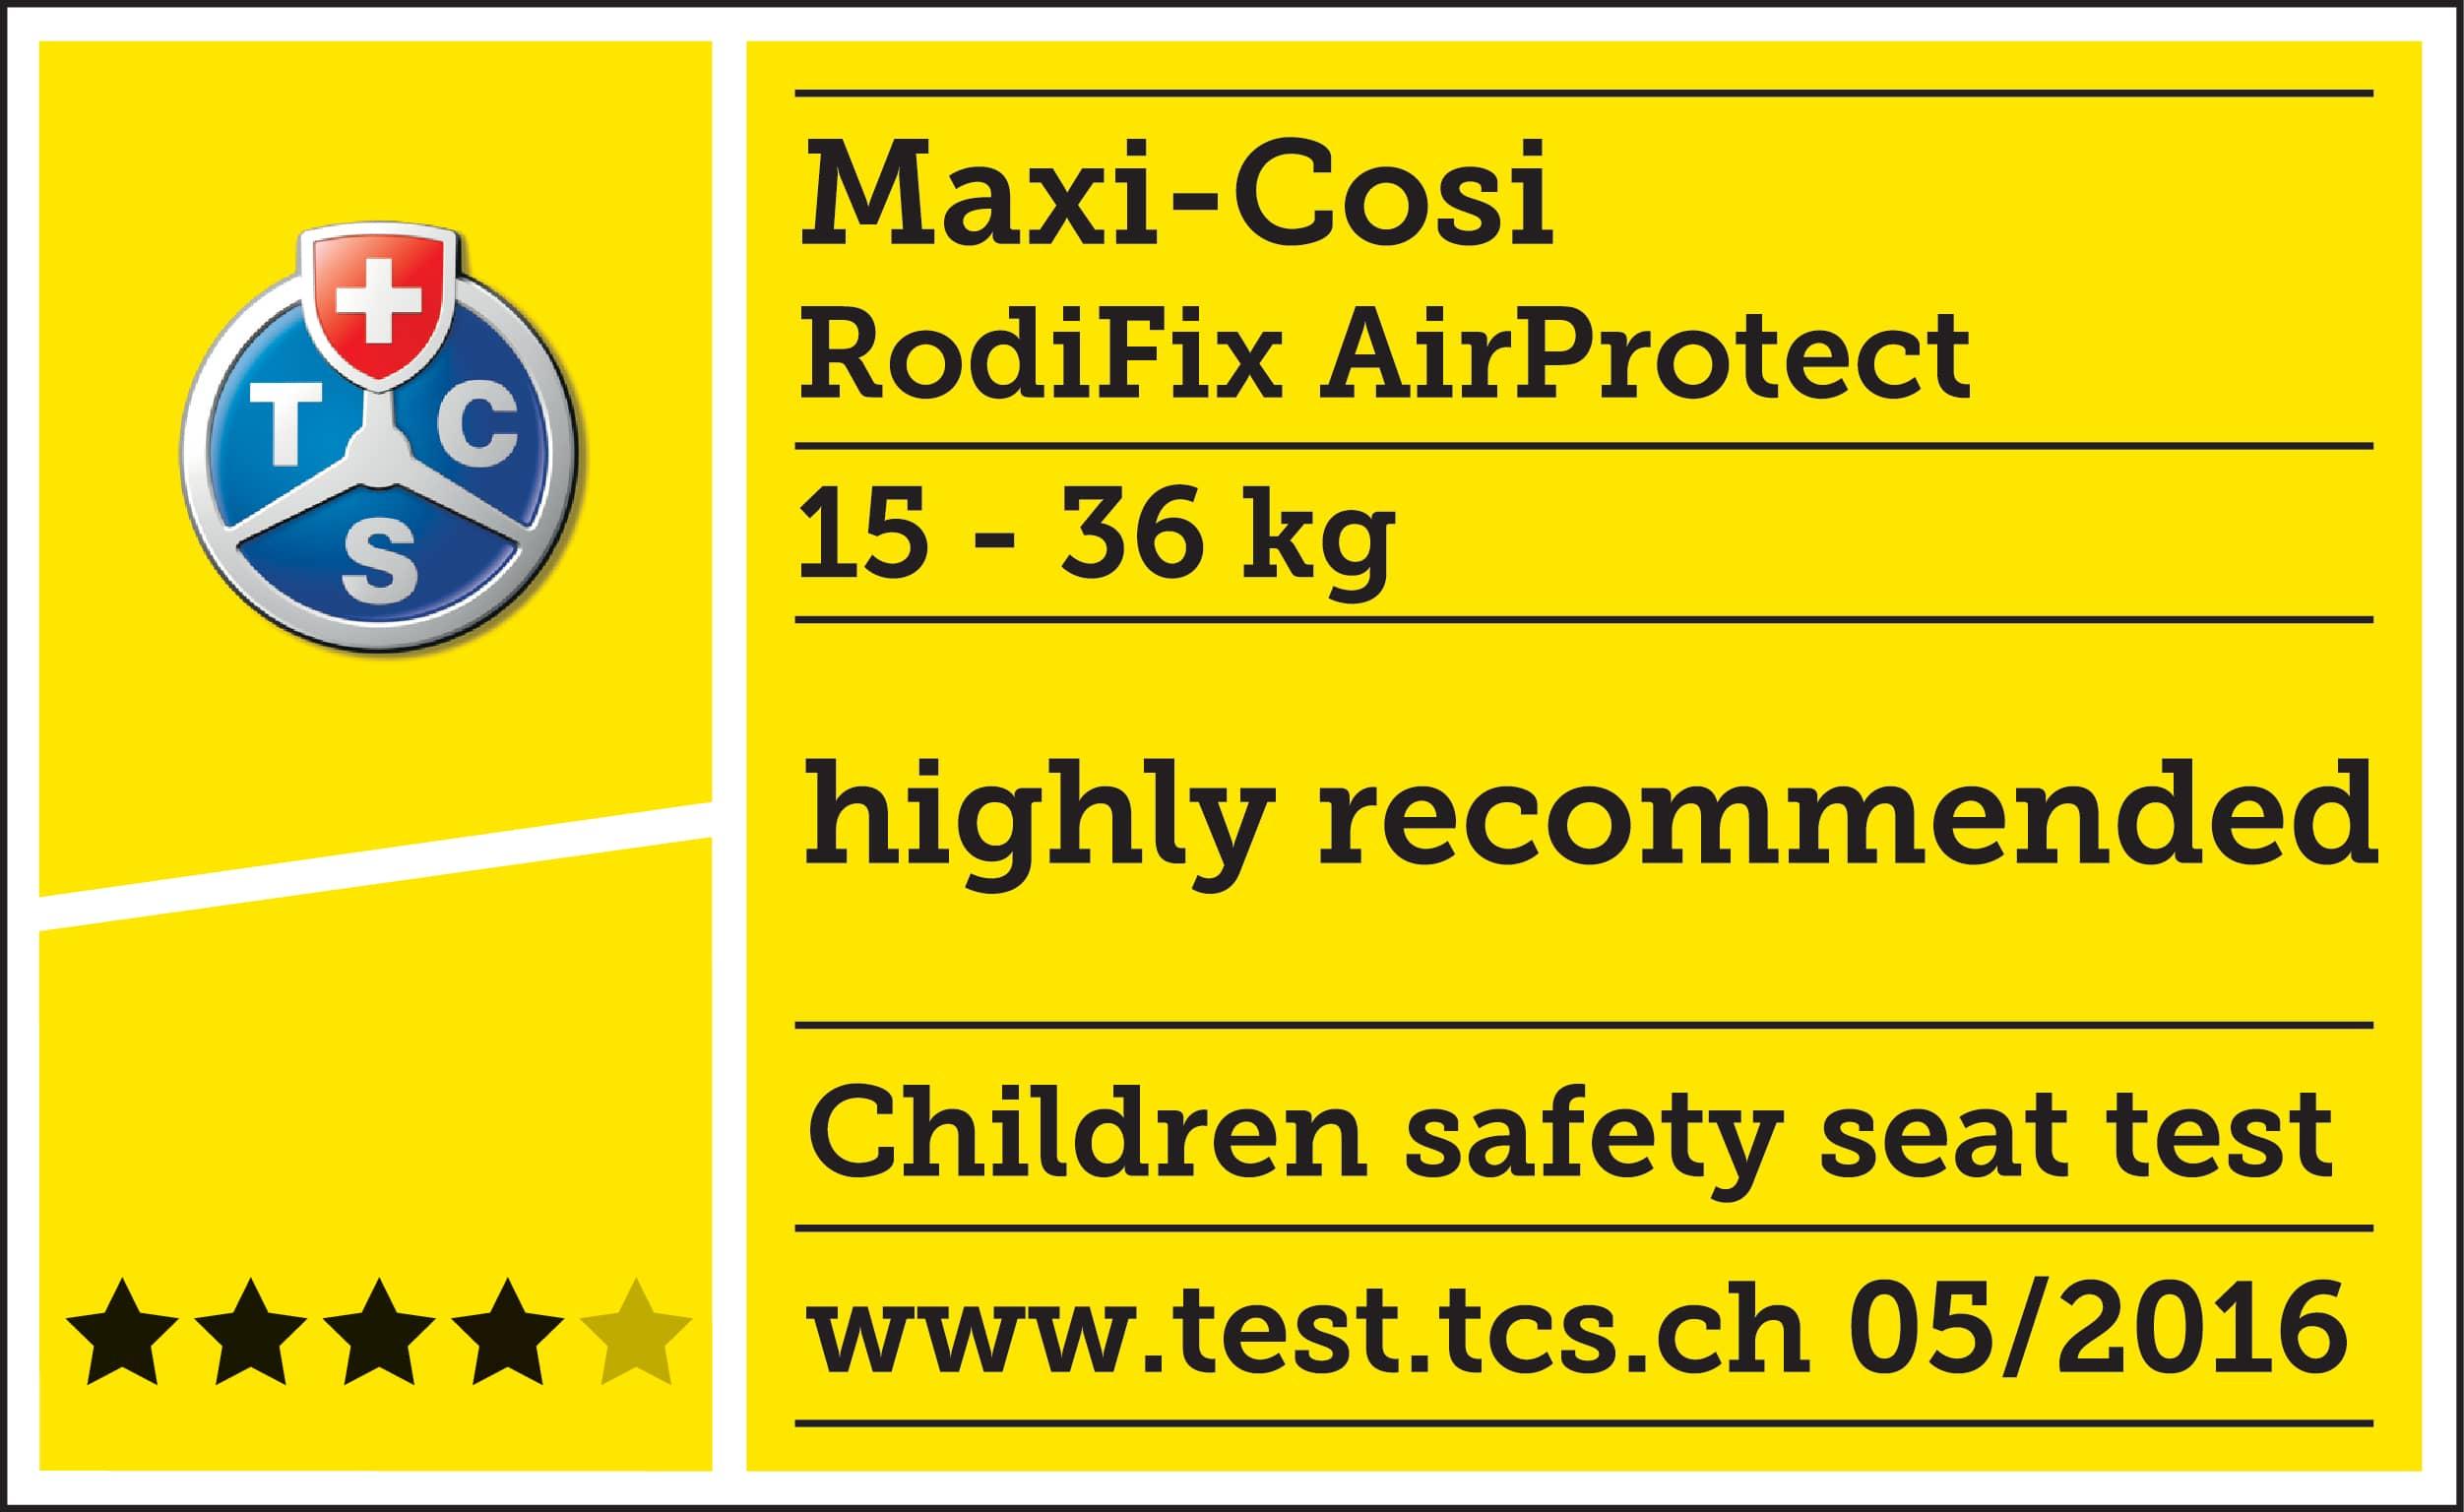 RodiFix AirProtect